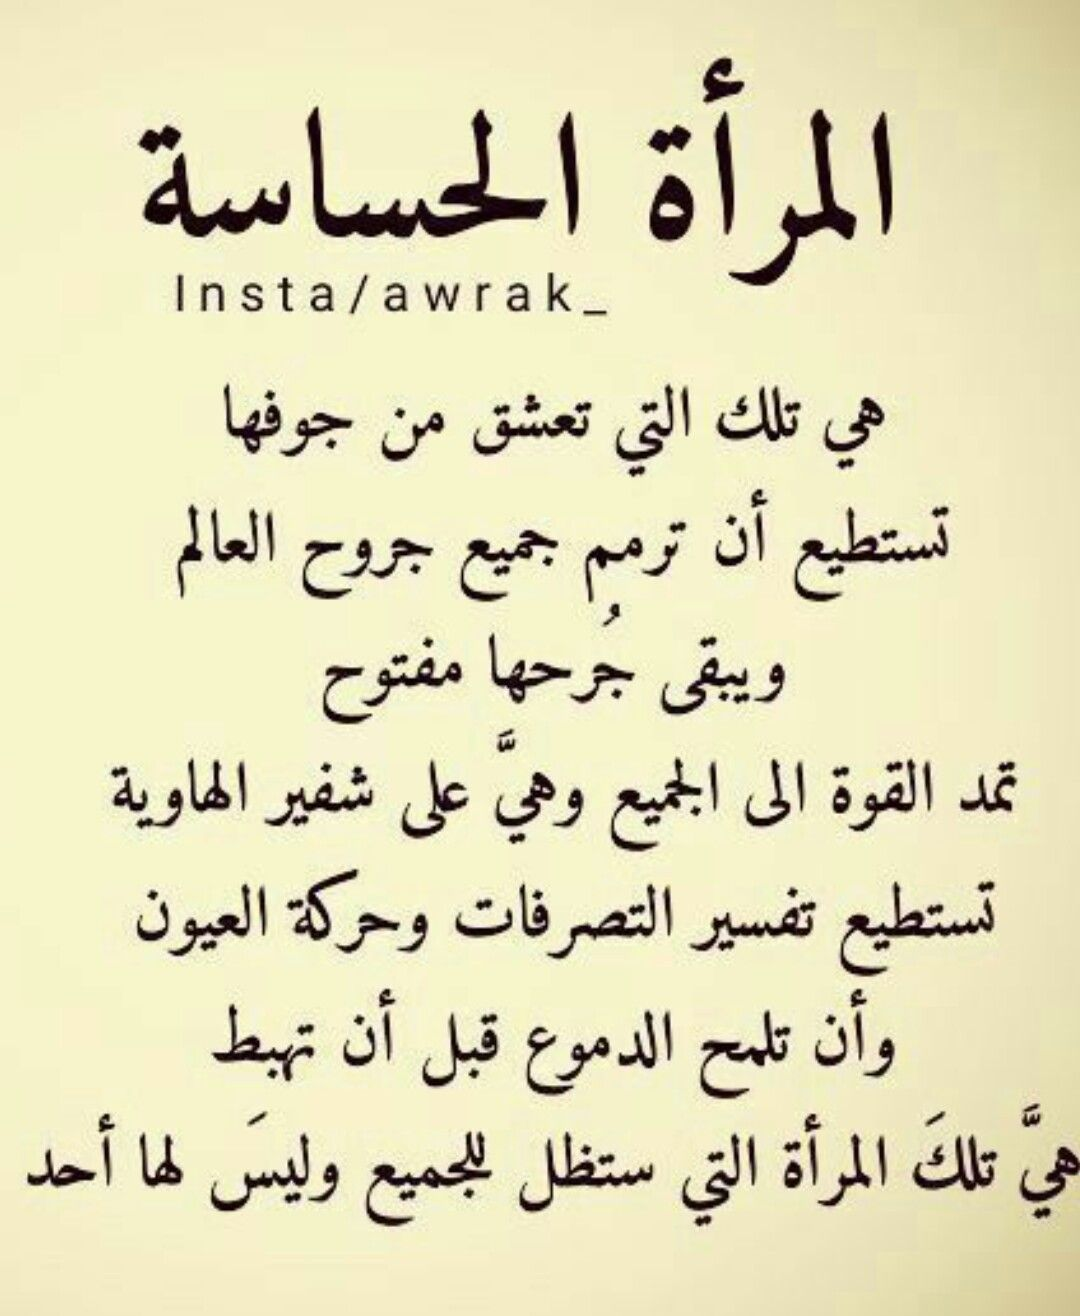 Pin By Adam On Islam Math Arabic Calligraphy Calligraphy